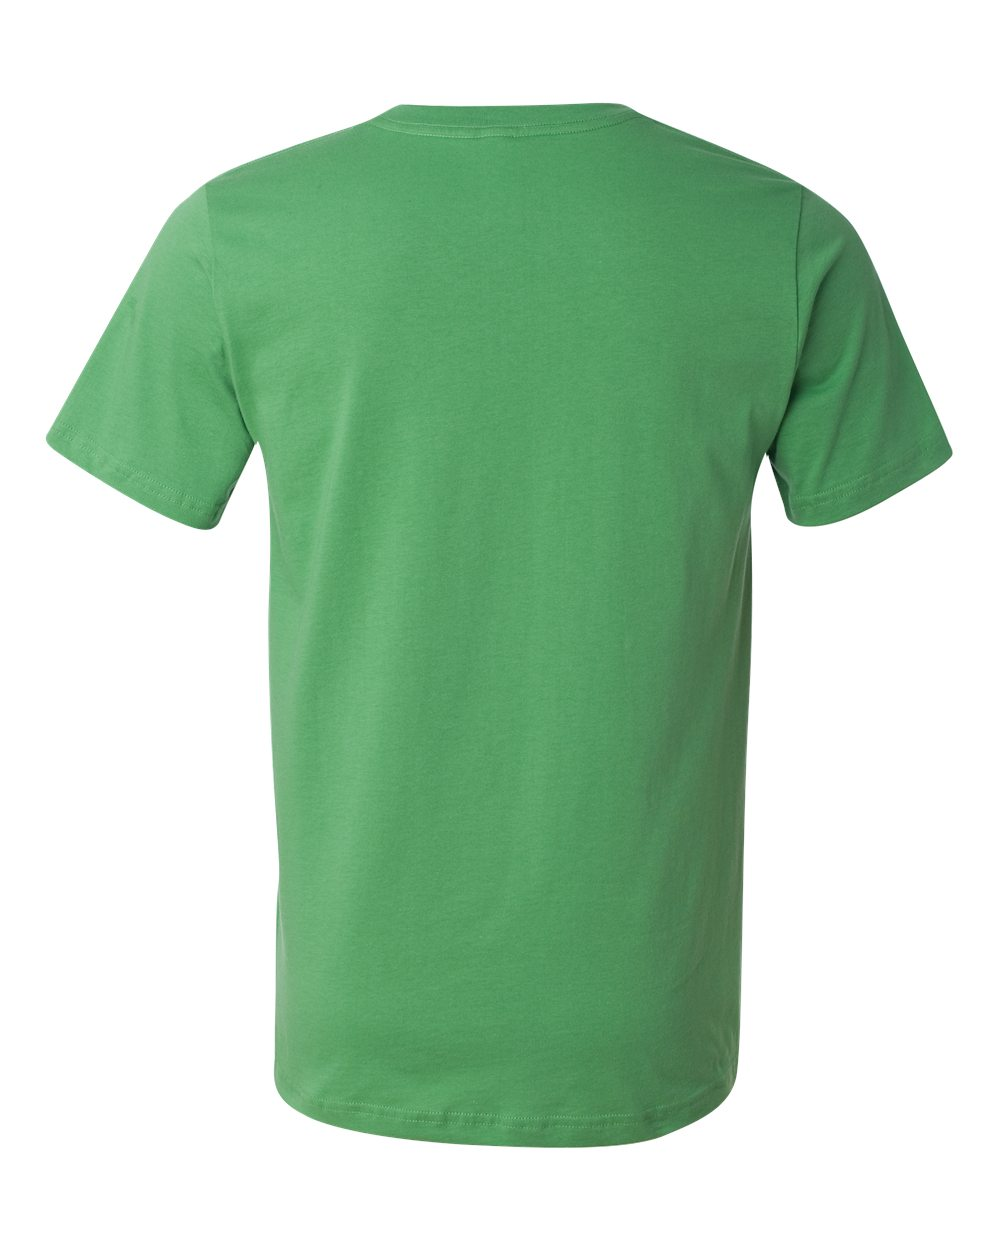 Bella-Canvas-Unisex-Made-in-USA-Jersey-Short-Sleeve-T-Shirt-3001U-XS-3XL thumbnail 31